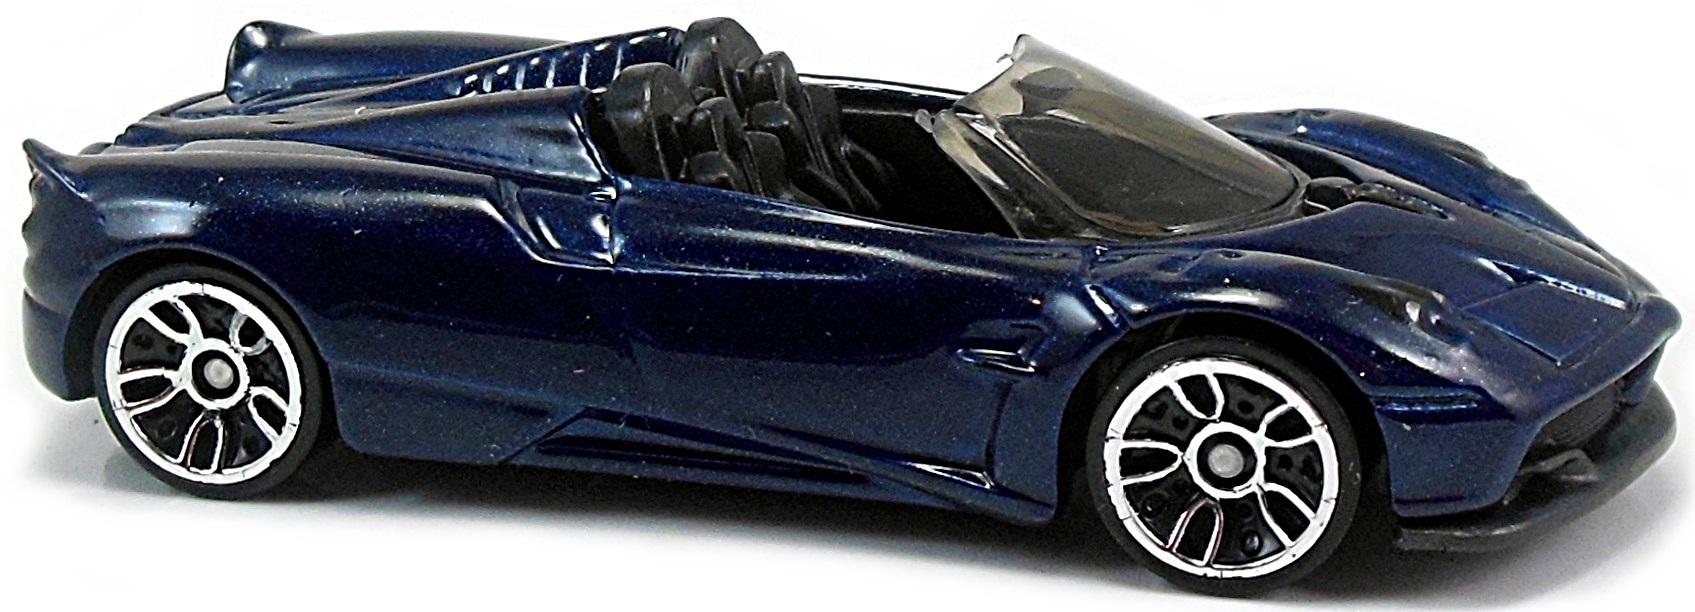 DS pagani huayra roadster : 17 Pagani Huayra Roadster - 73mm - 2017 | Hot Wheels Newsletter